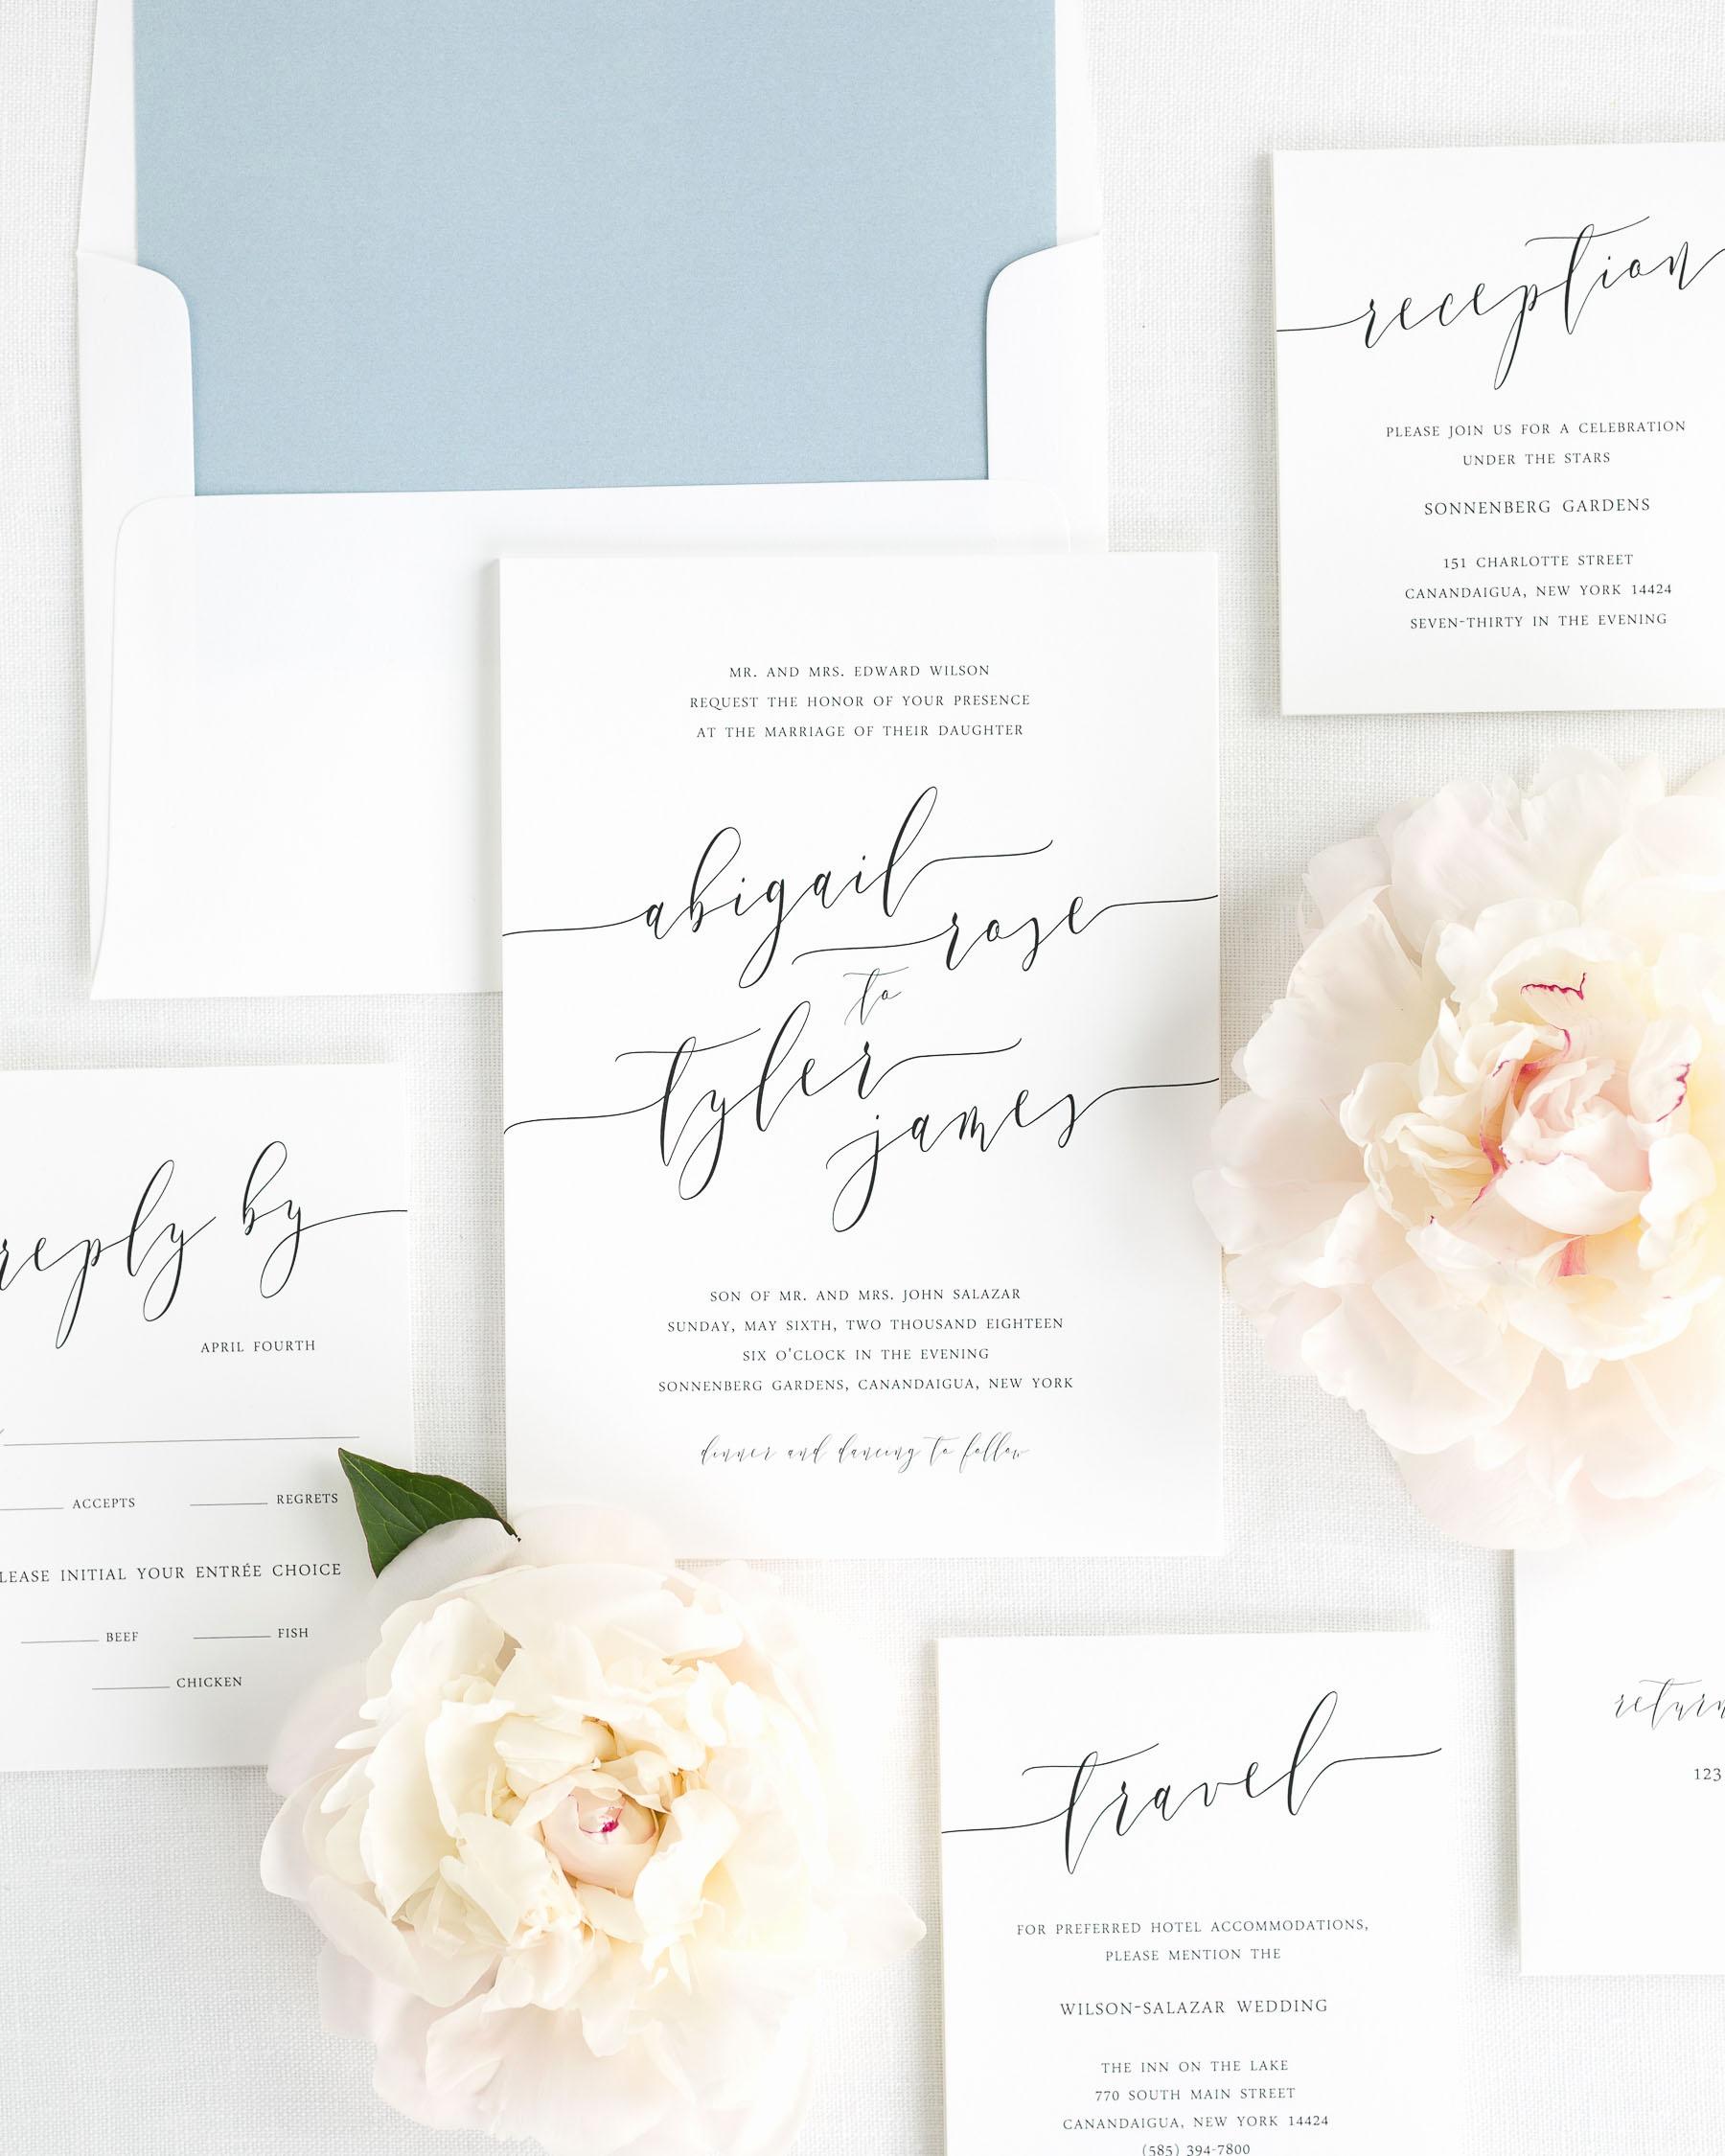 Wedding Invitations with Pictures Elegant Romantic Calligraphy Wedding Invitations Wedding